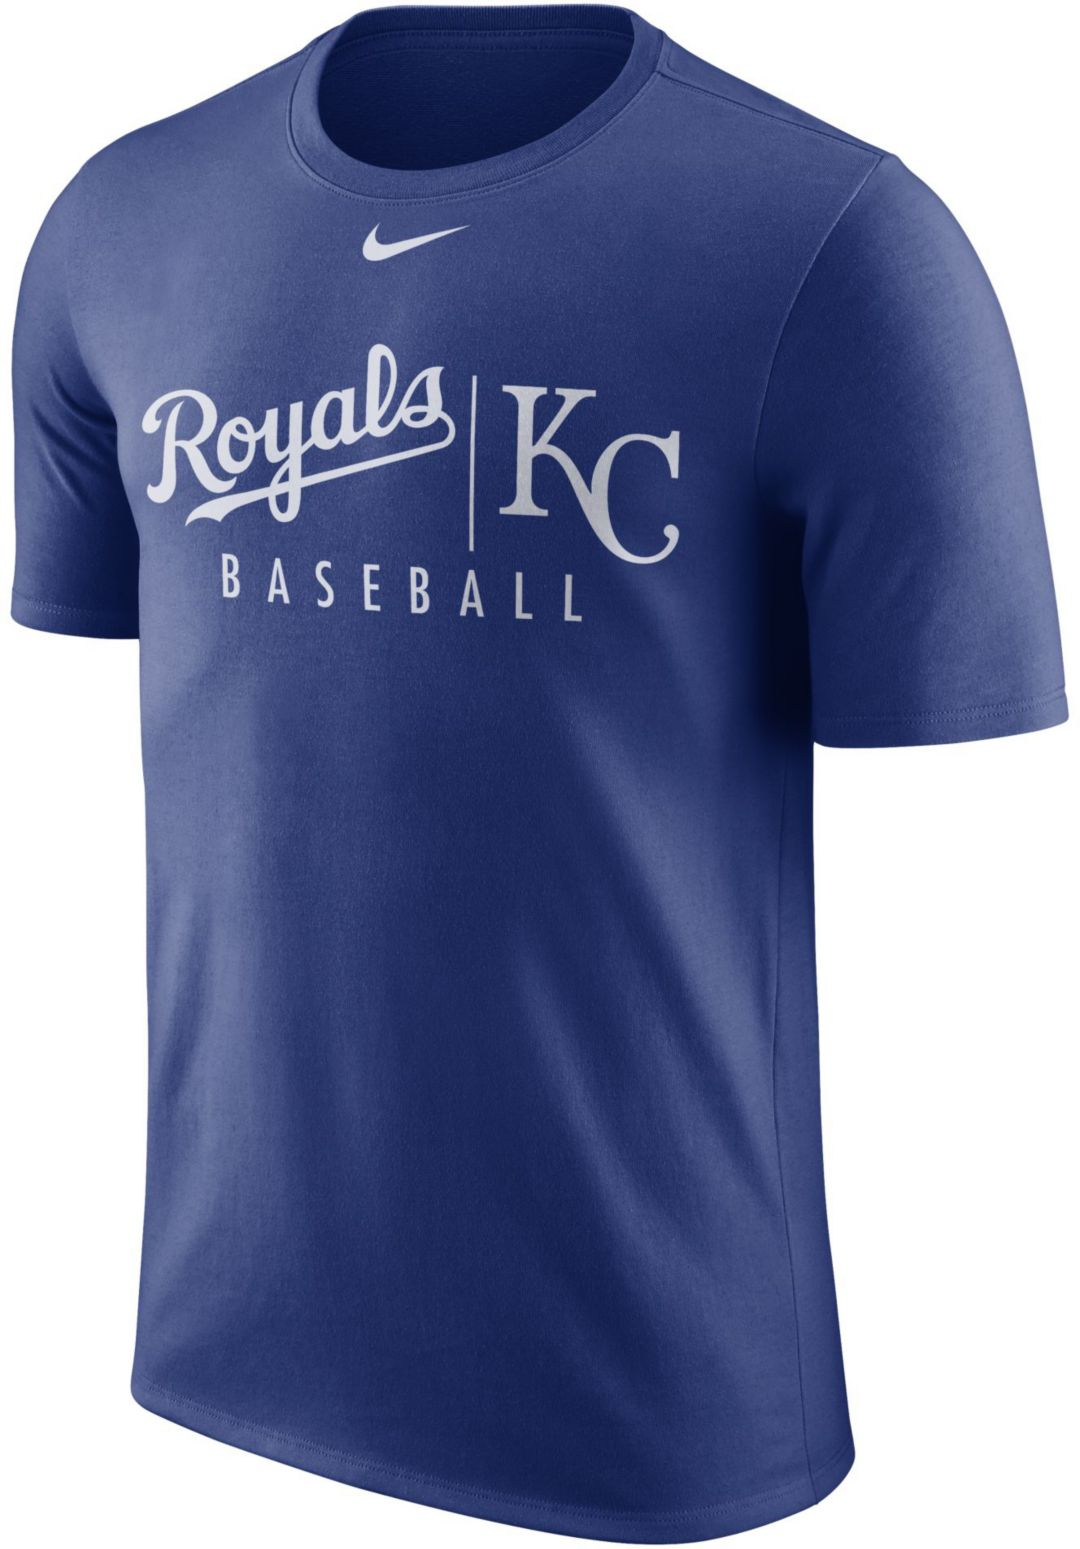 0975dd1a Nike Men's Kansas City Royals Practice T-Shirt. noImageFound. Previous